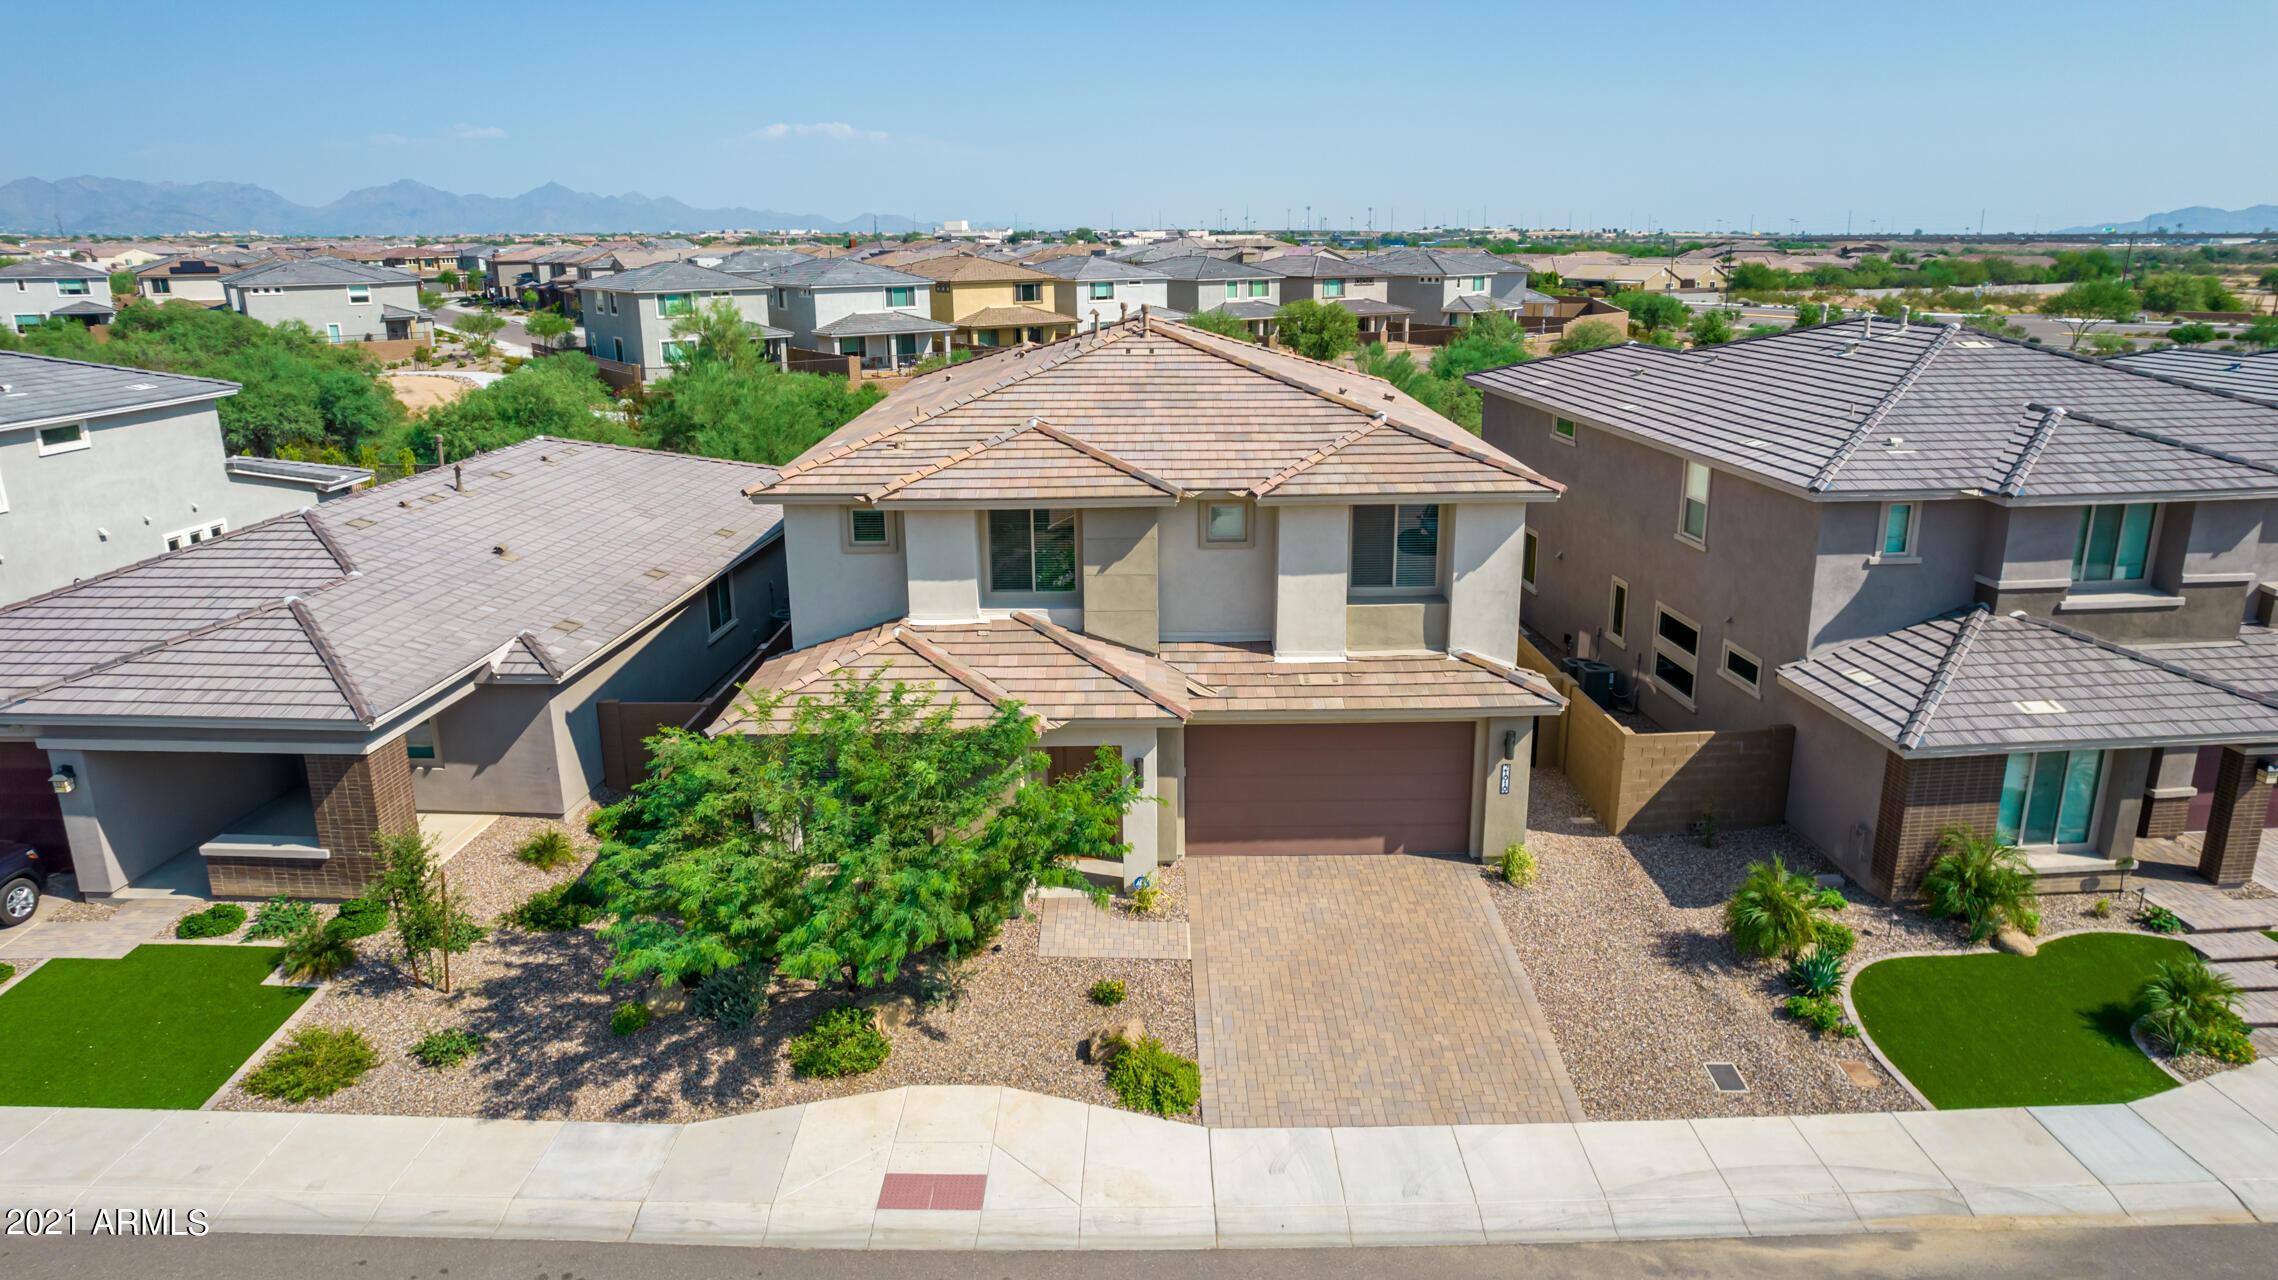 21919 30TH Street, Phoenix, Arizona 85050, 4 Bedrooms Bedrooms, ,3.5 BathroomsBathrooms,Residential,For Sale,30TH,6293942